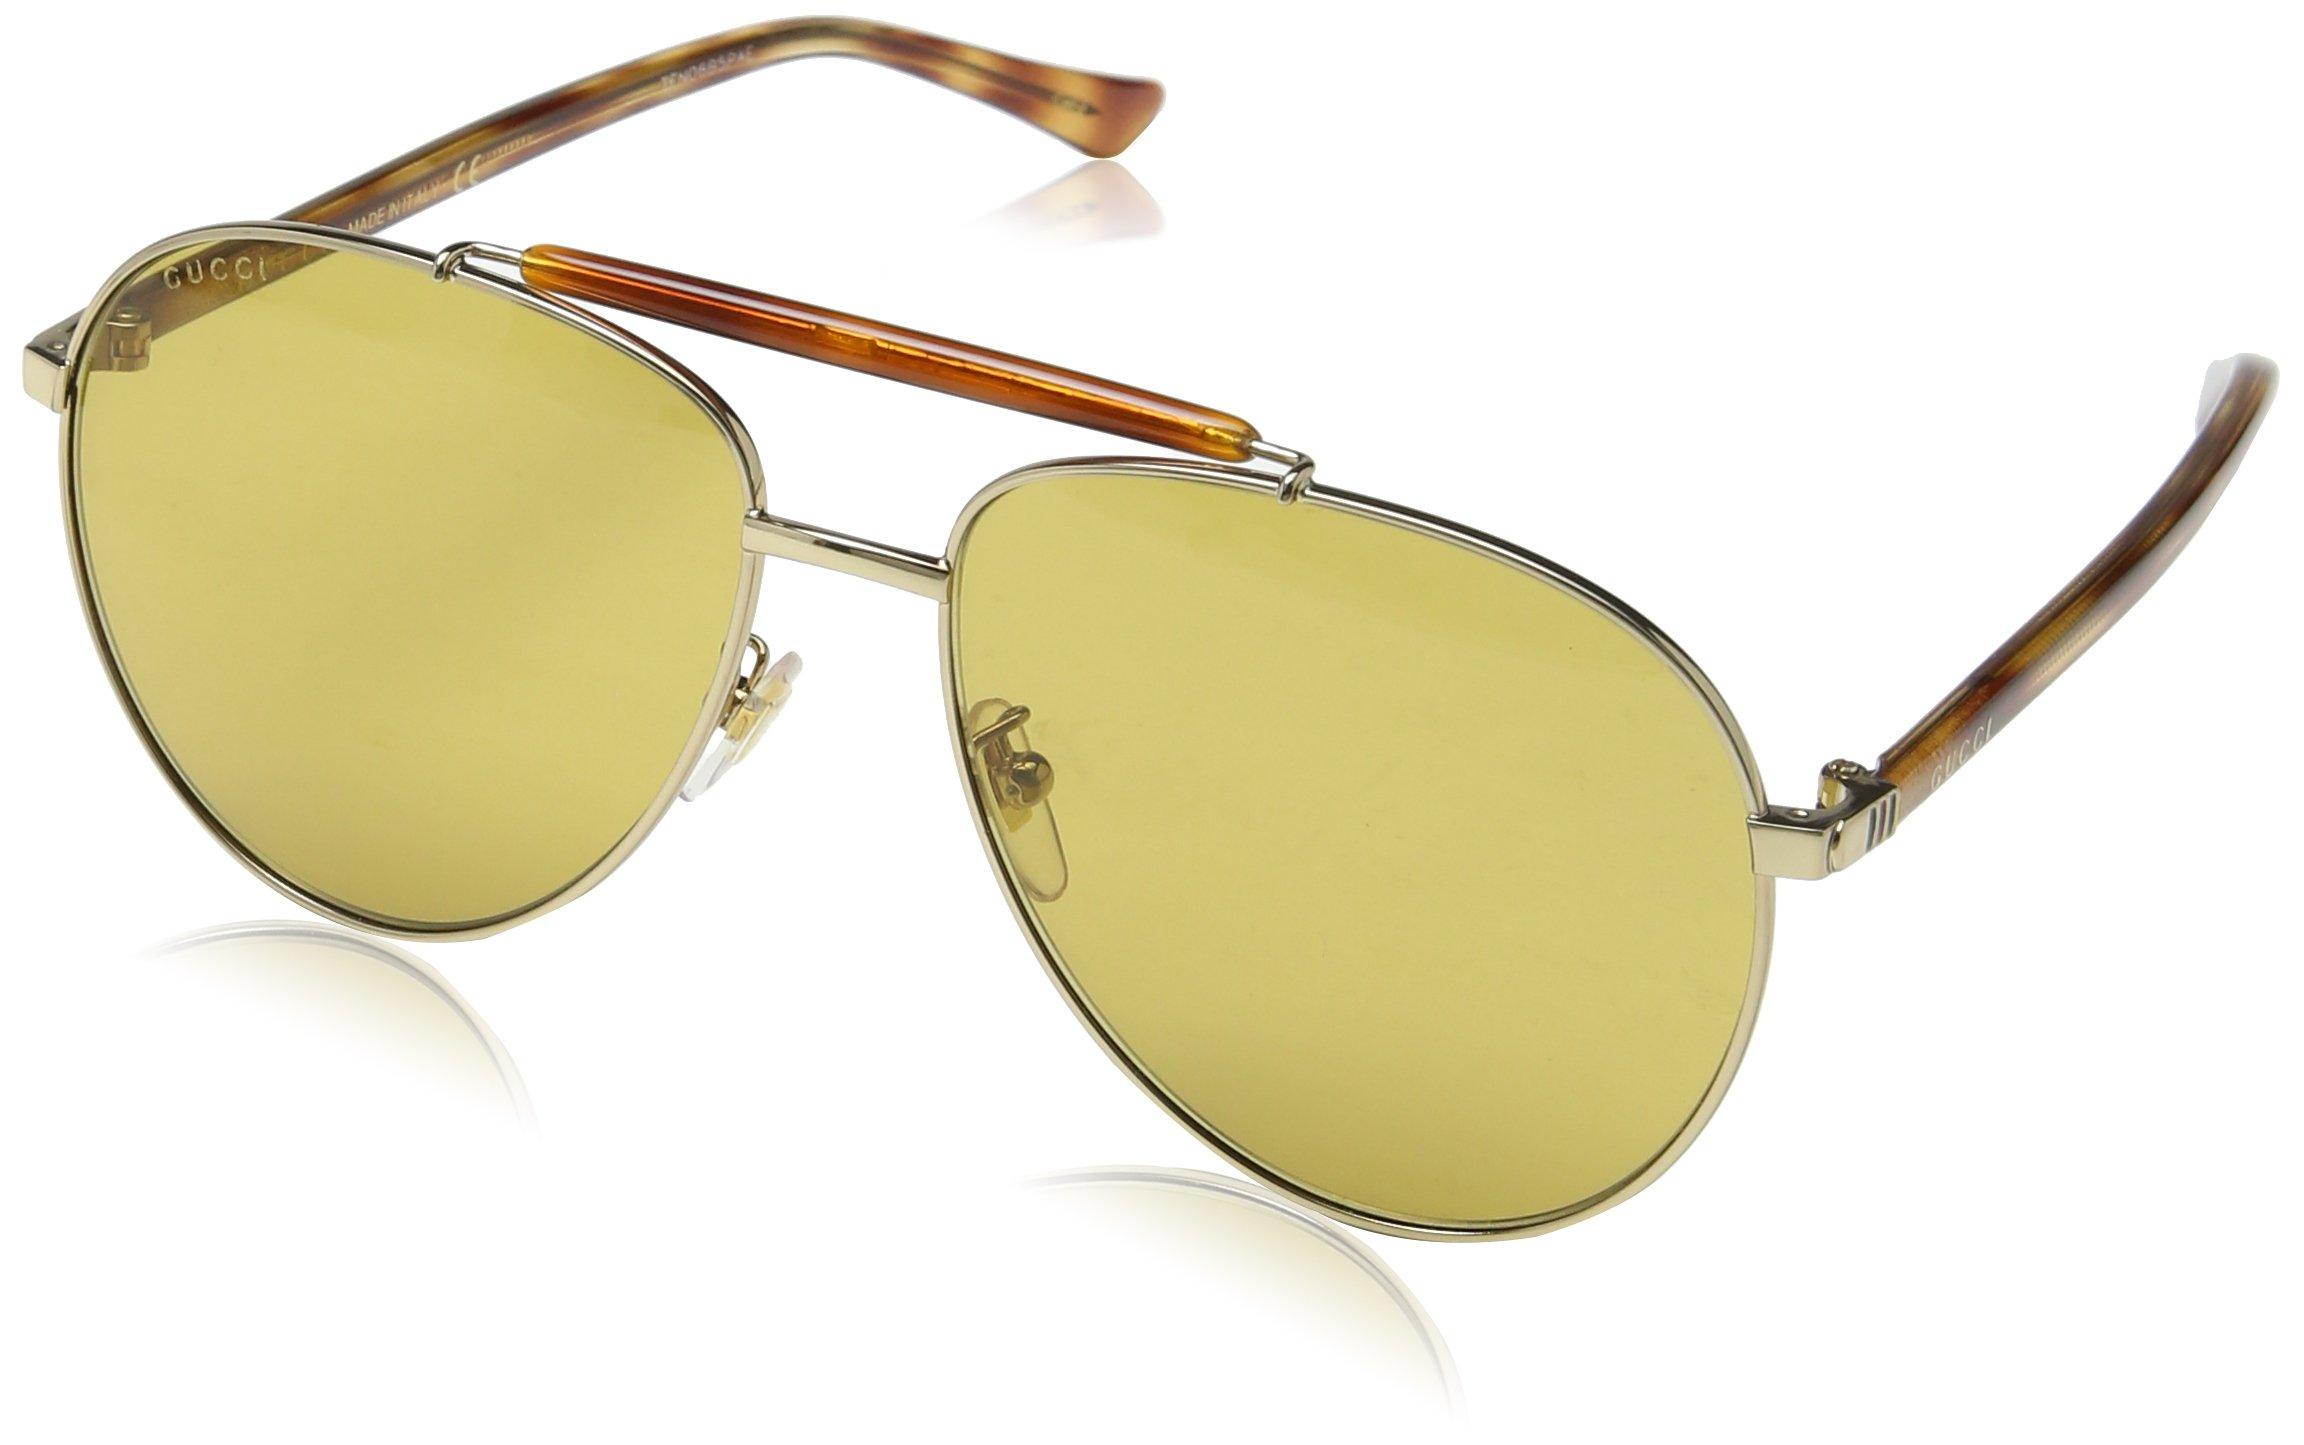 Gucci Gg0014s Fashion Sunglasses, One Size, Gold / Brown / Avana